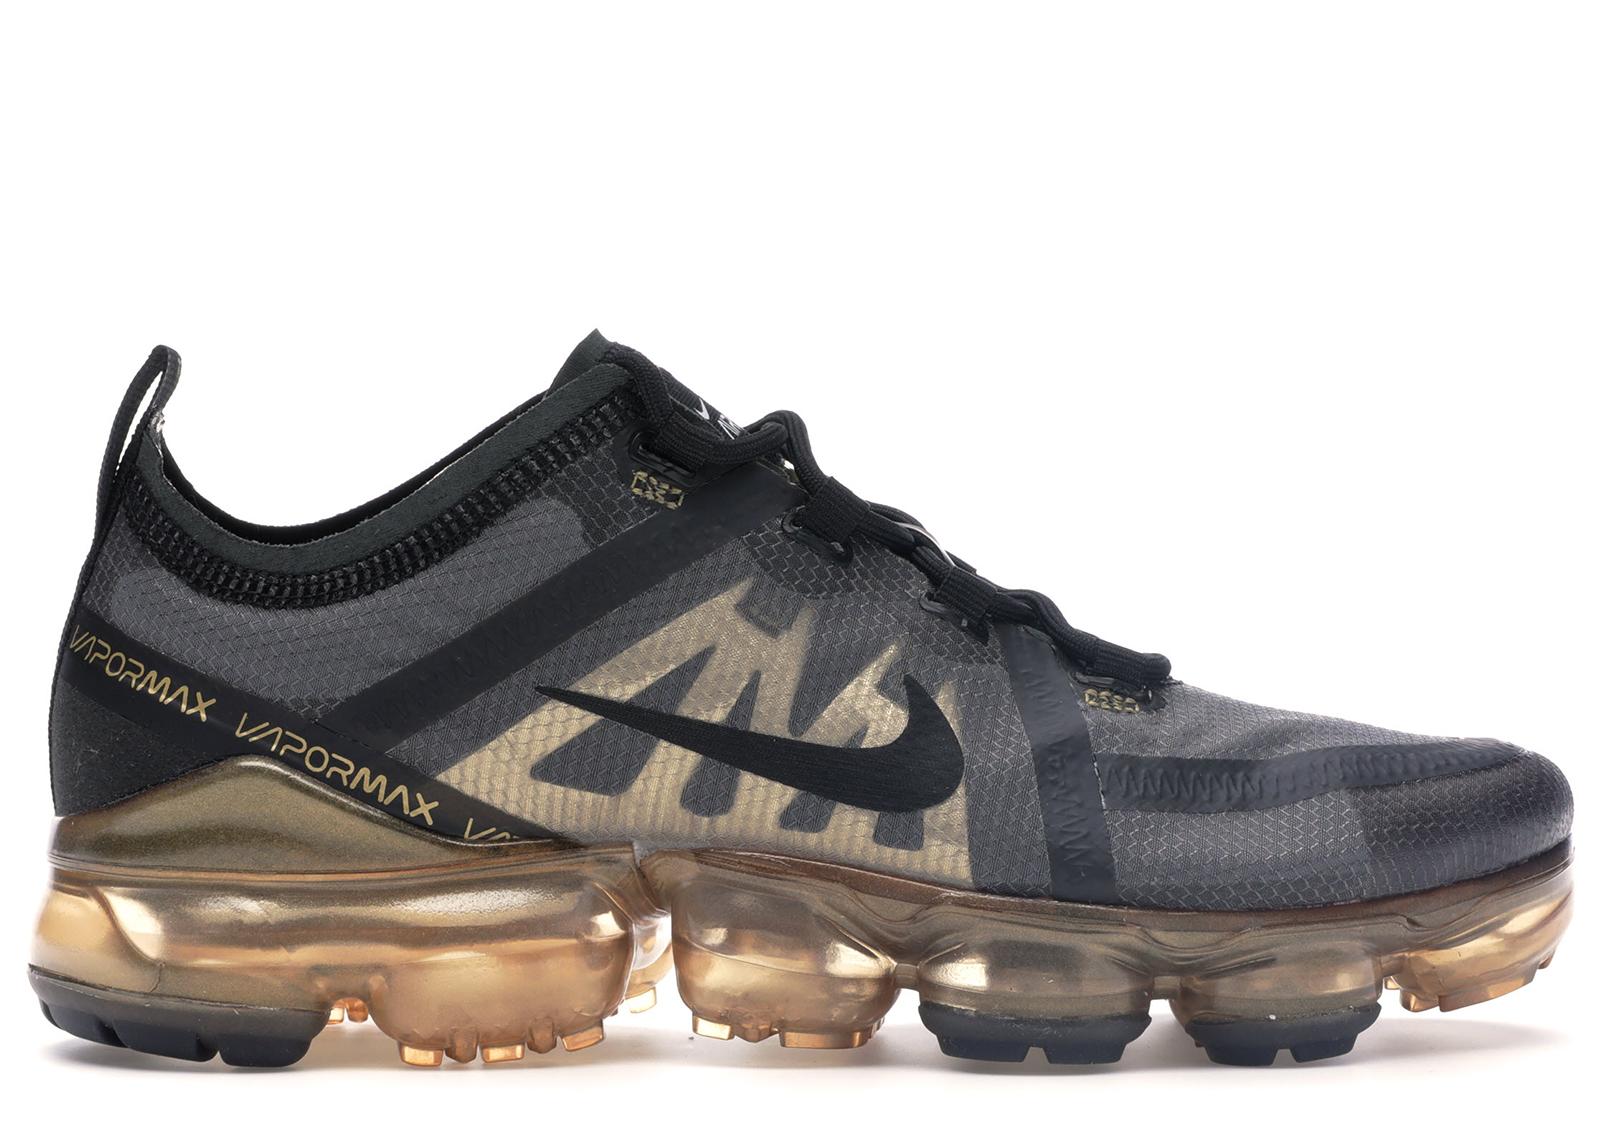 Nike Air VaporMax 2019 Black Metallic Gold